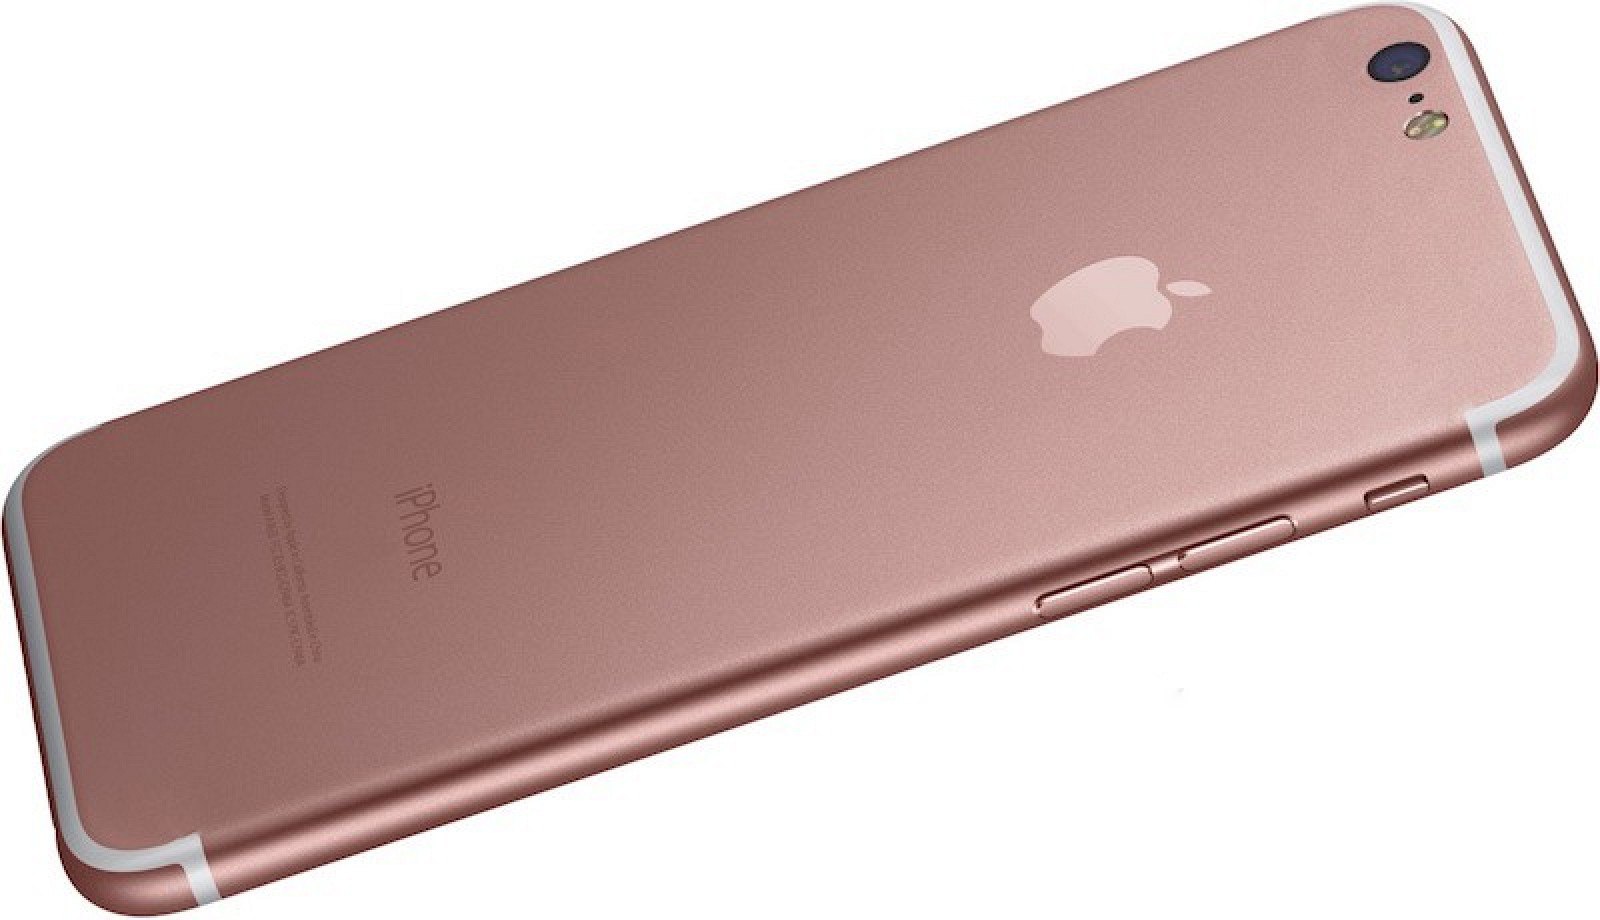 apple iphone 7 rumors (2-1)